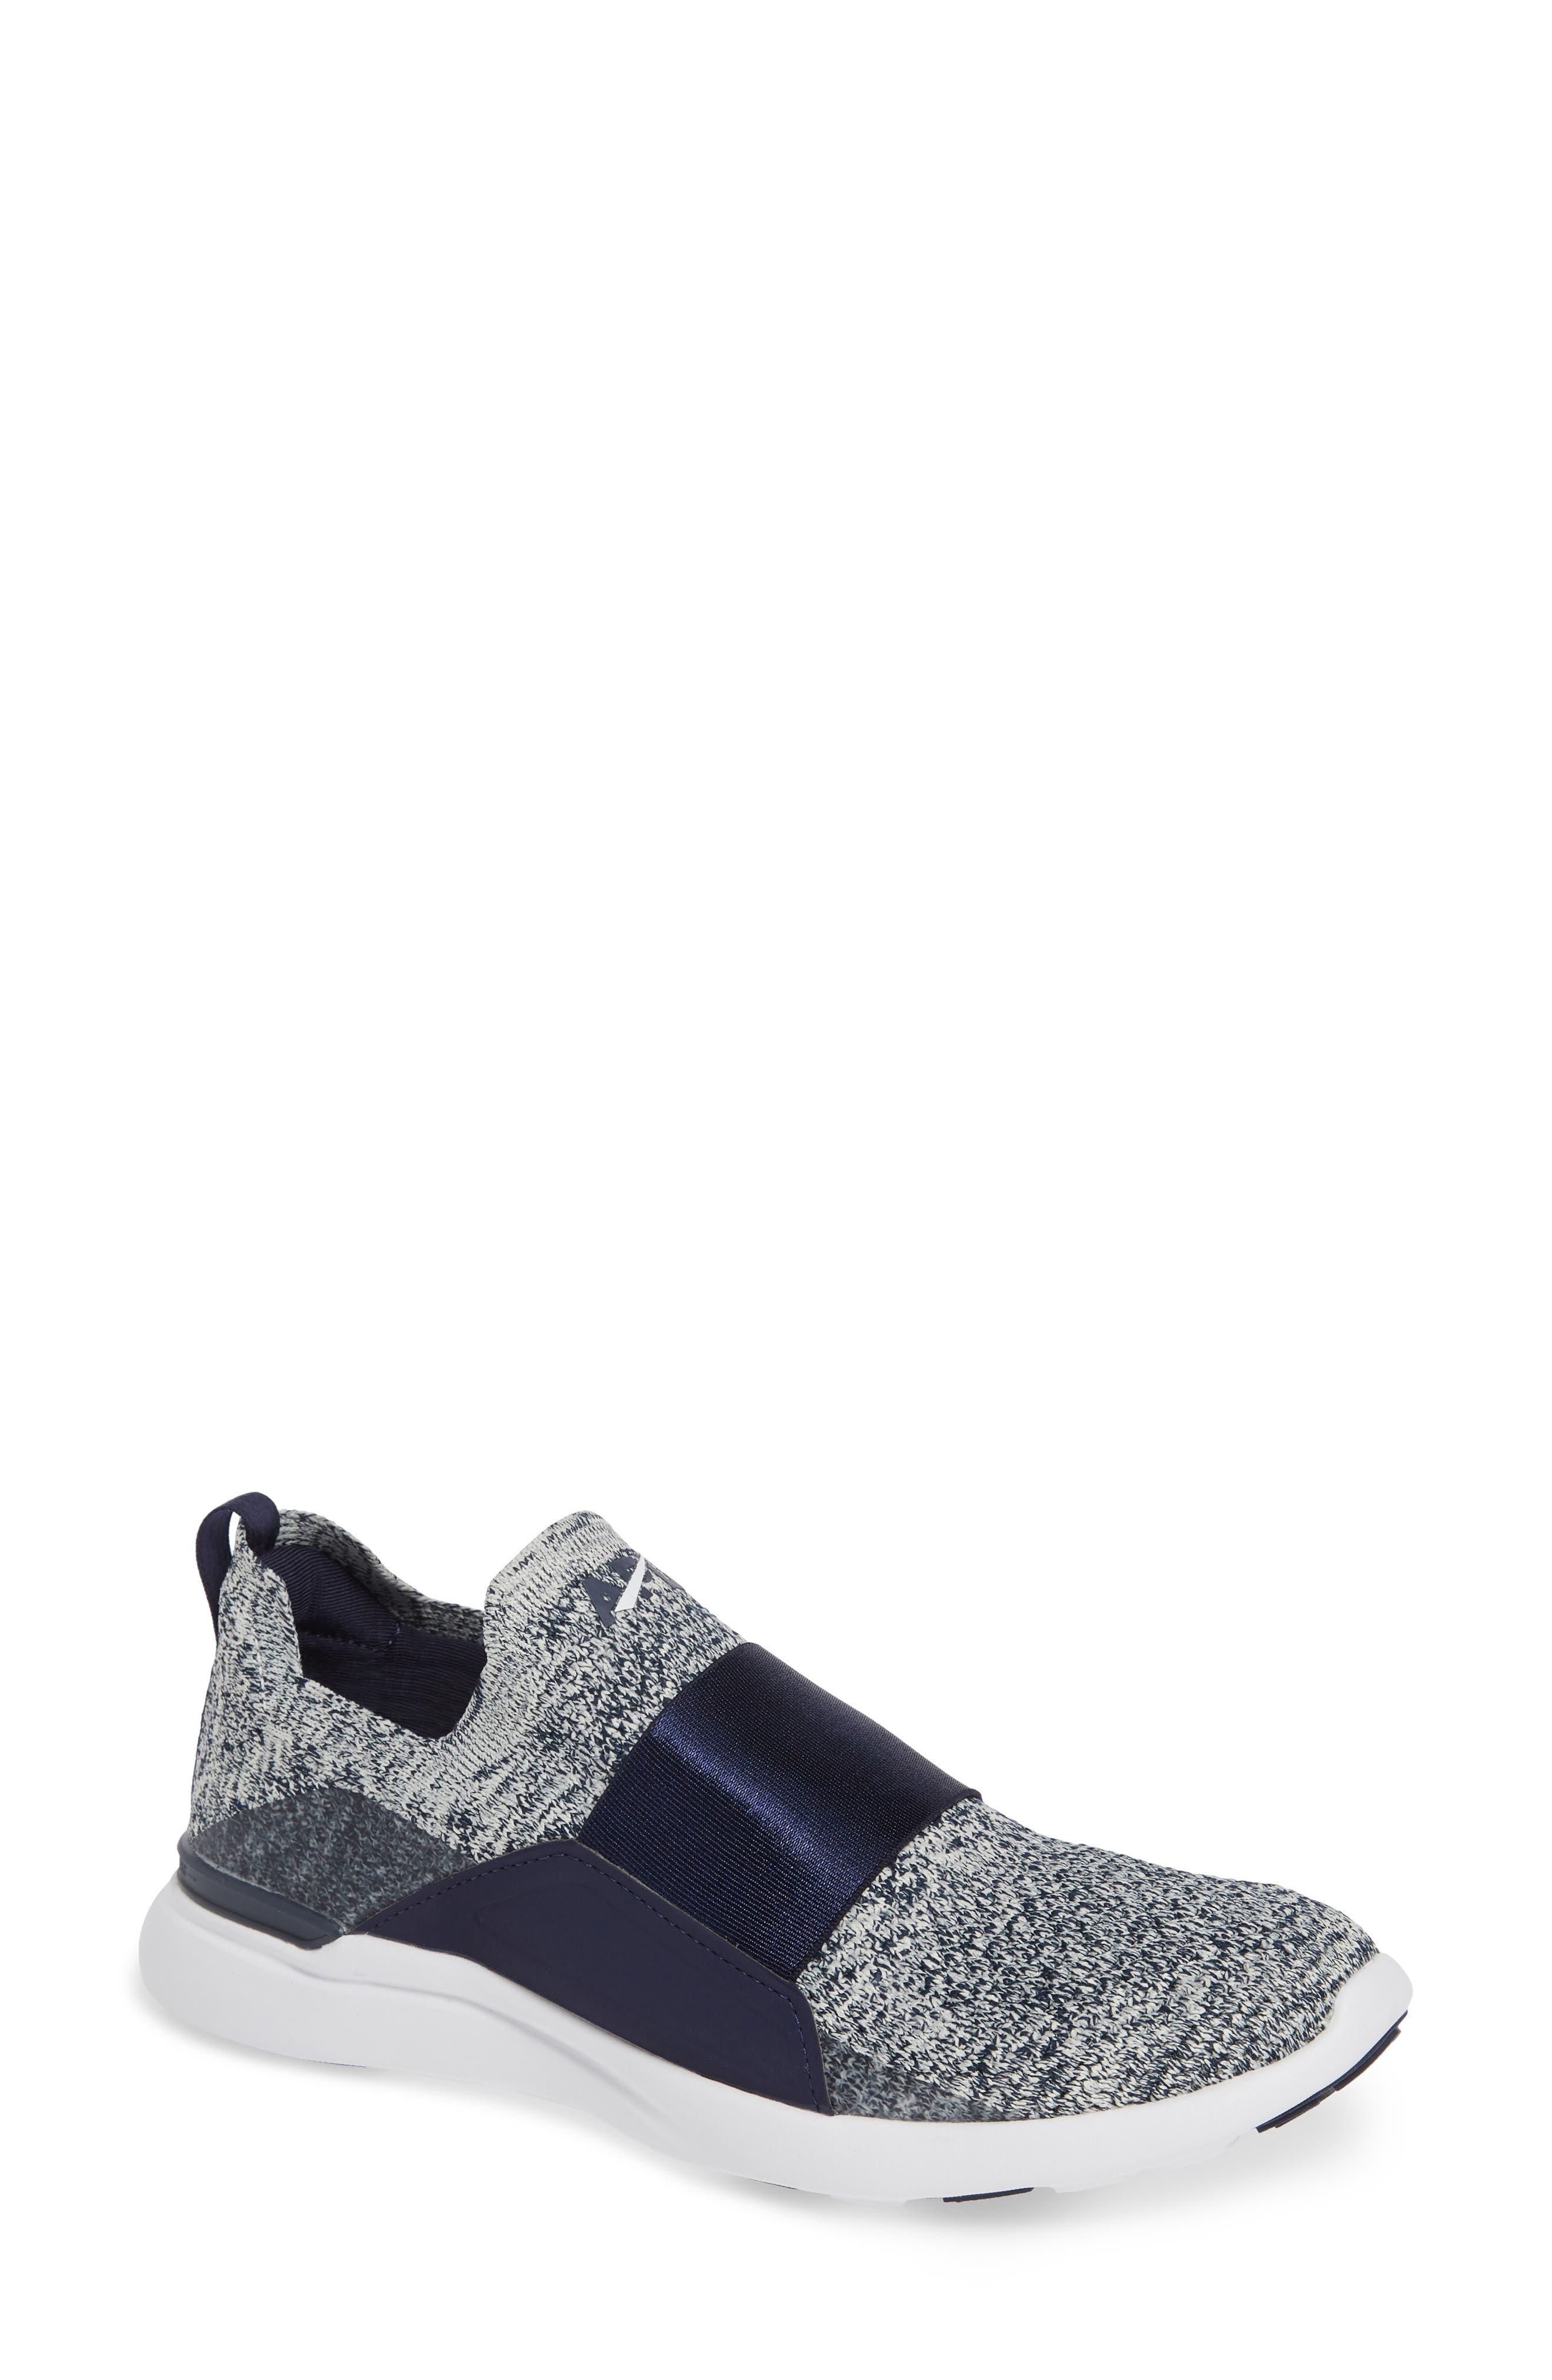 APL Techloom Bliss Knit Running Shoe, Main, color, NAVY/ PRISTINE/ WHITE